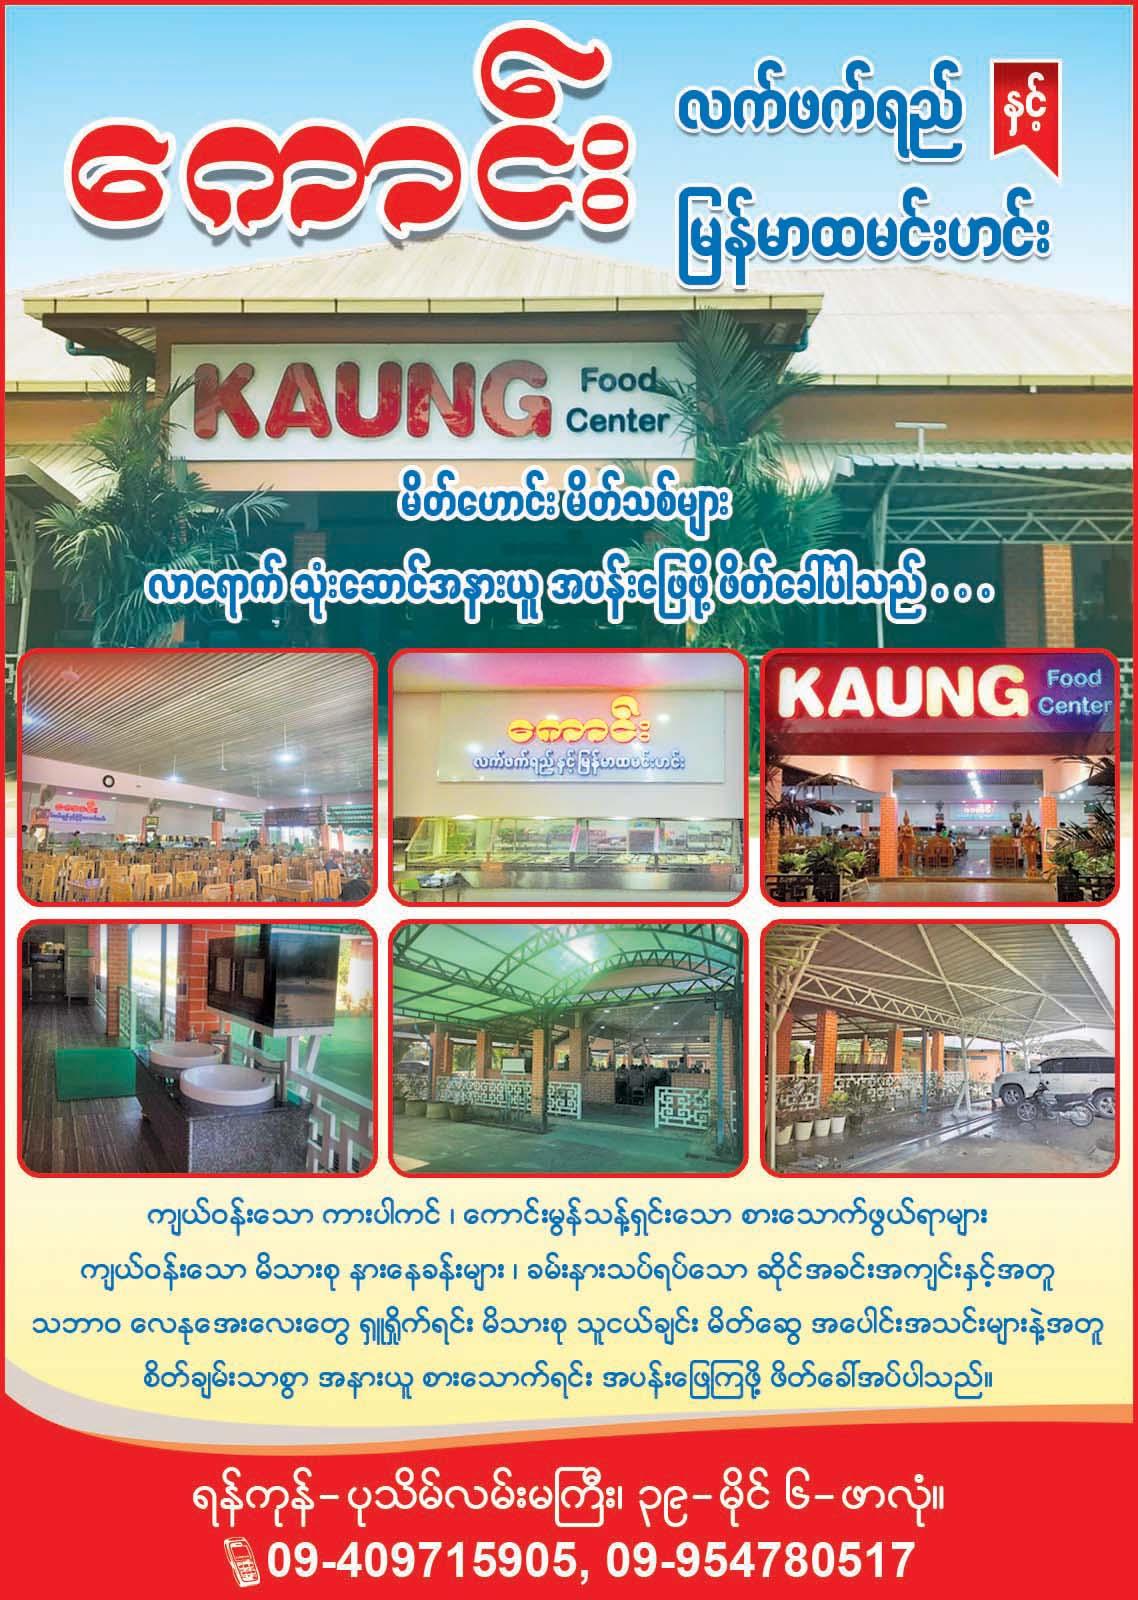 Kaung